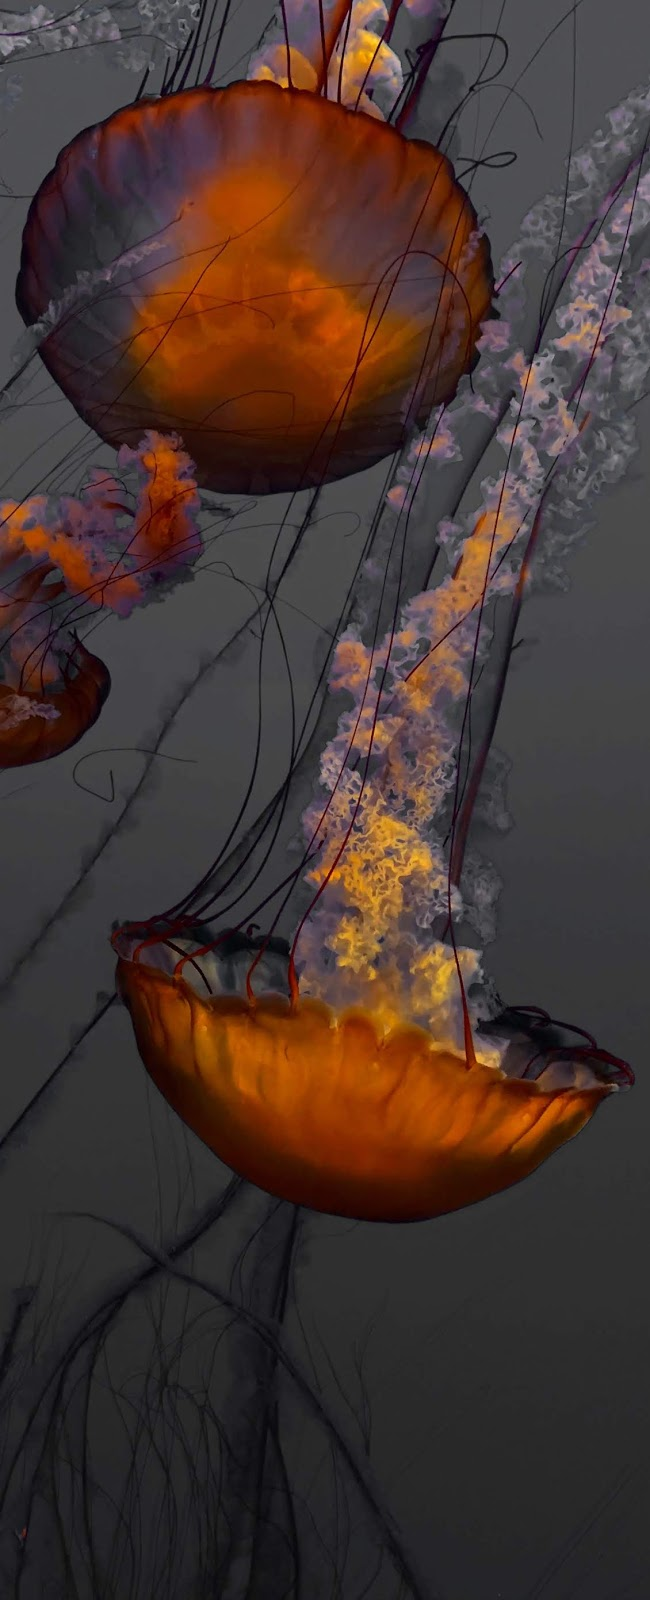 Amazing photo of jellyfish.